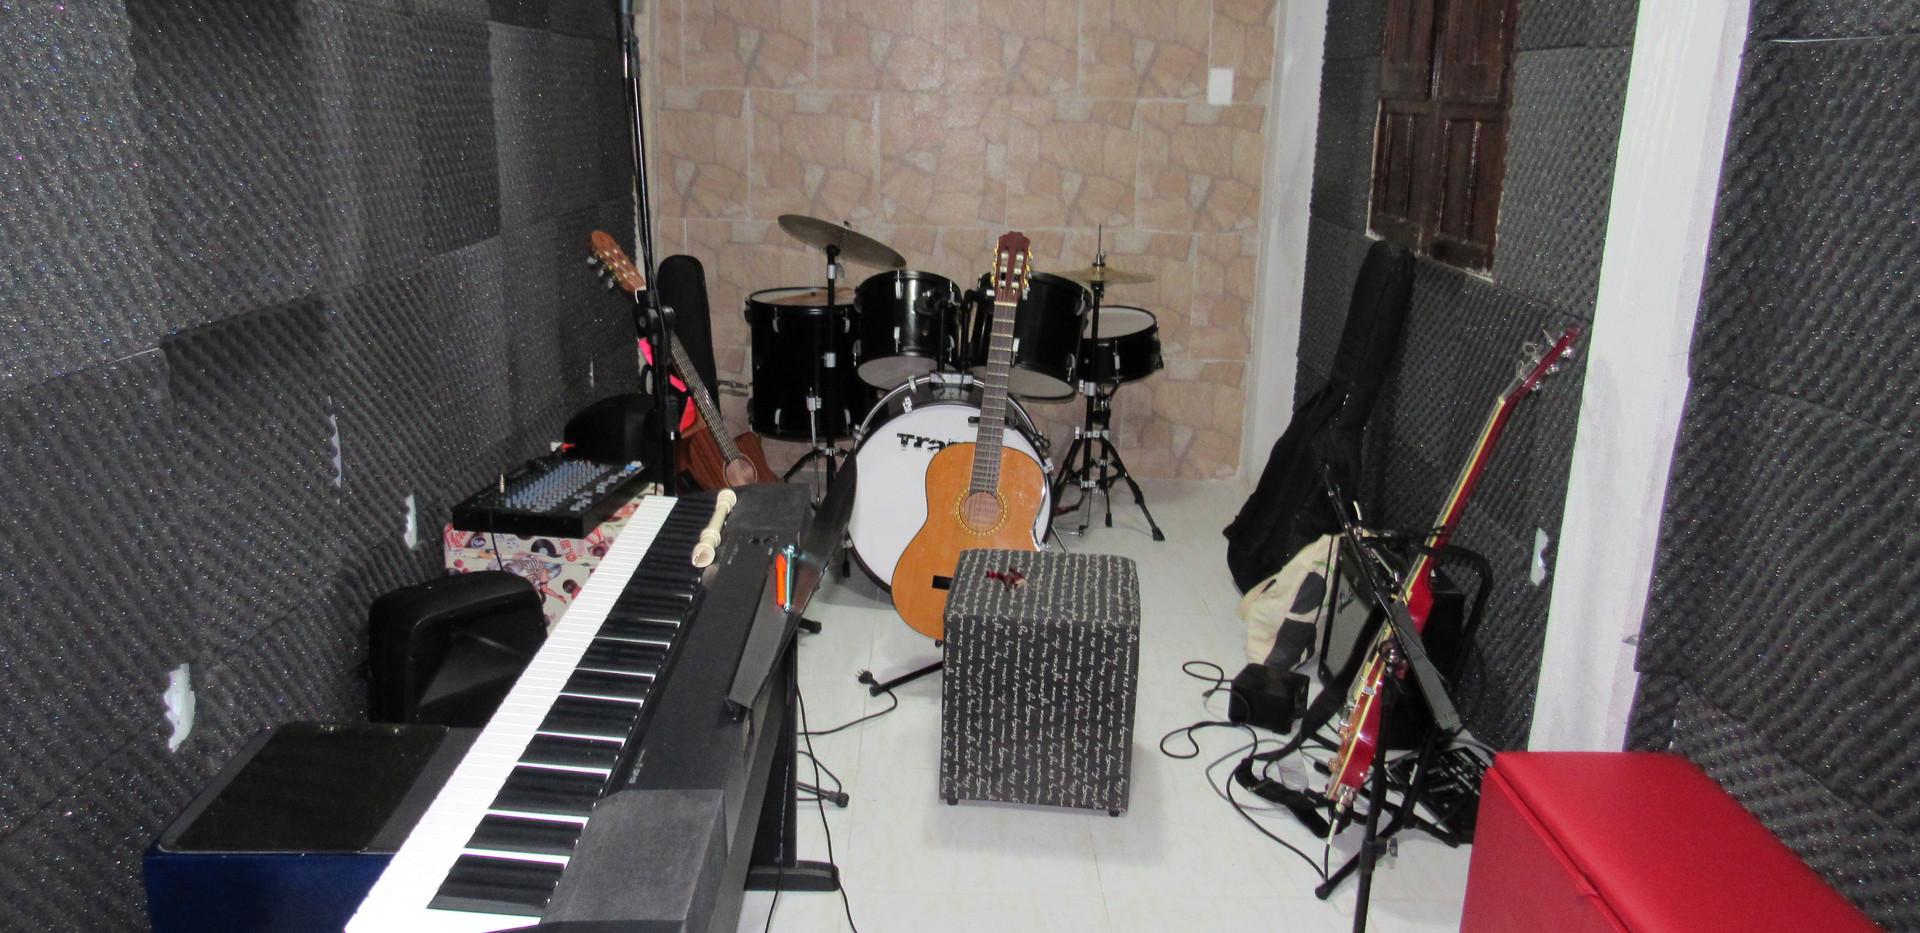 Estúdio_1_-_Casa_da_Musika.JPG